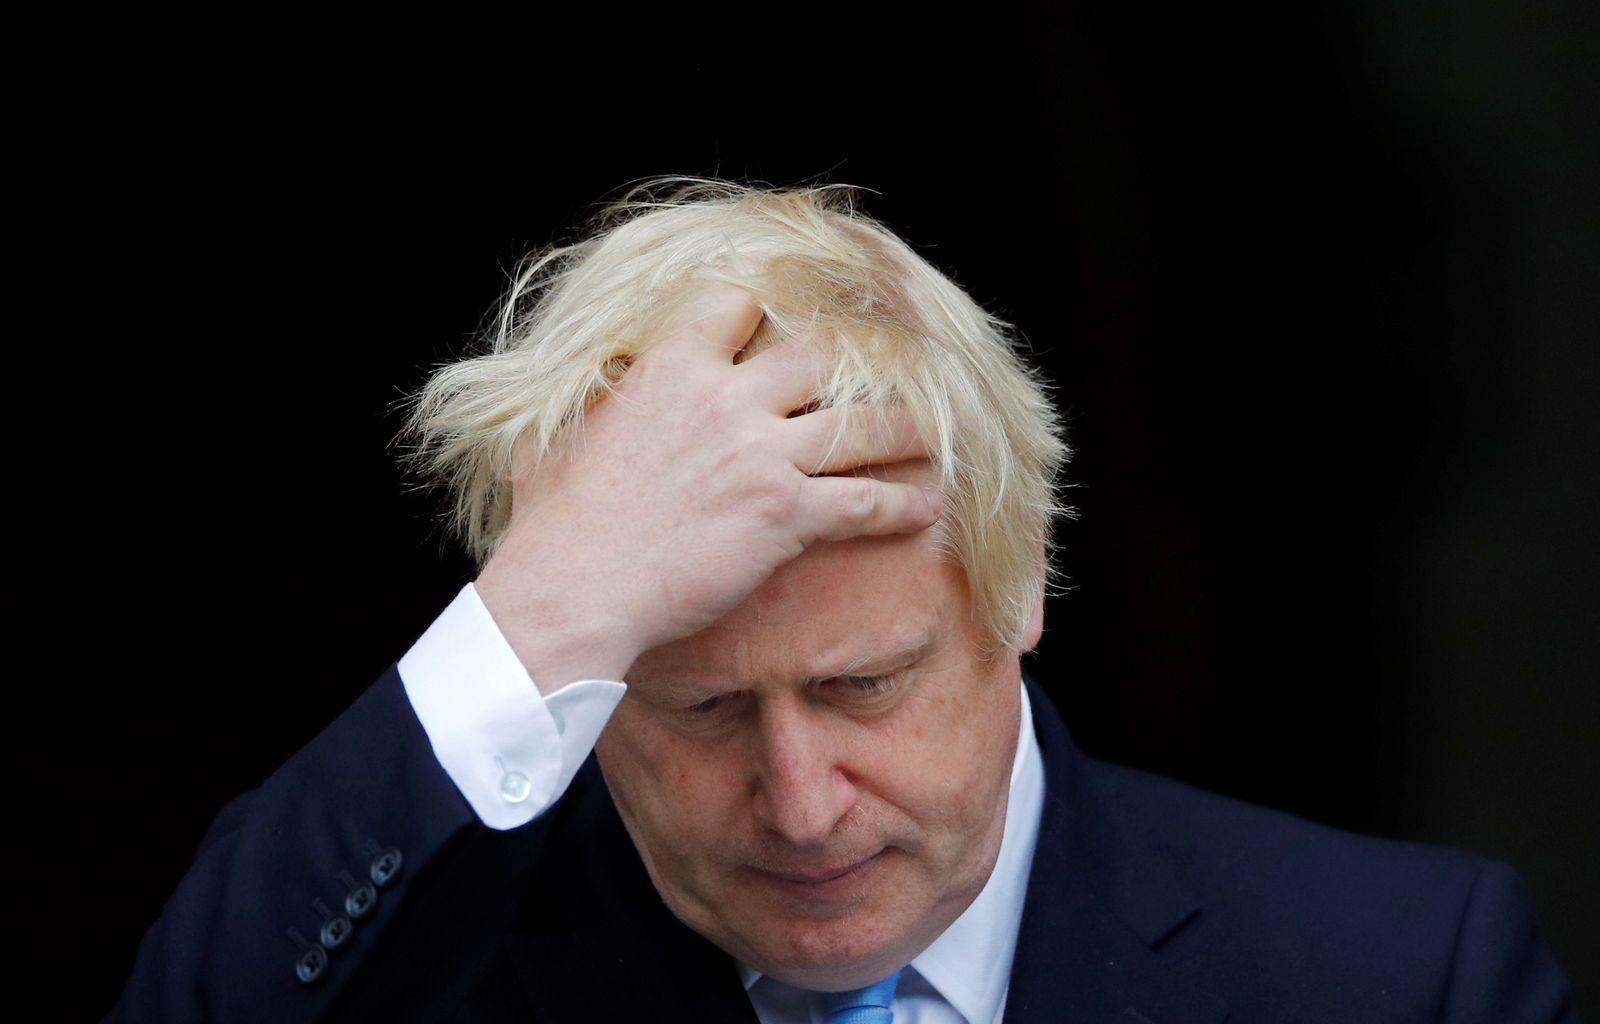 Boris Johnson/ Sept 2019